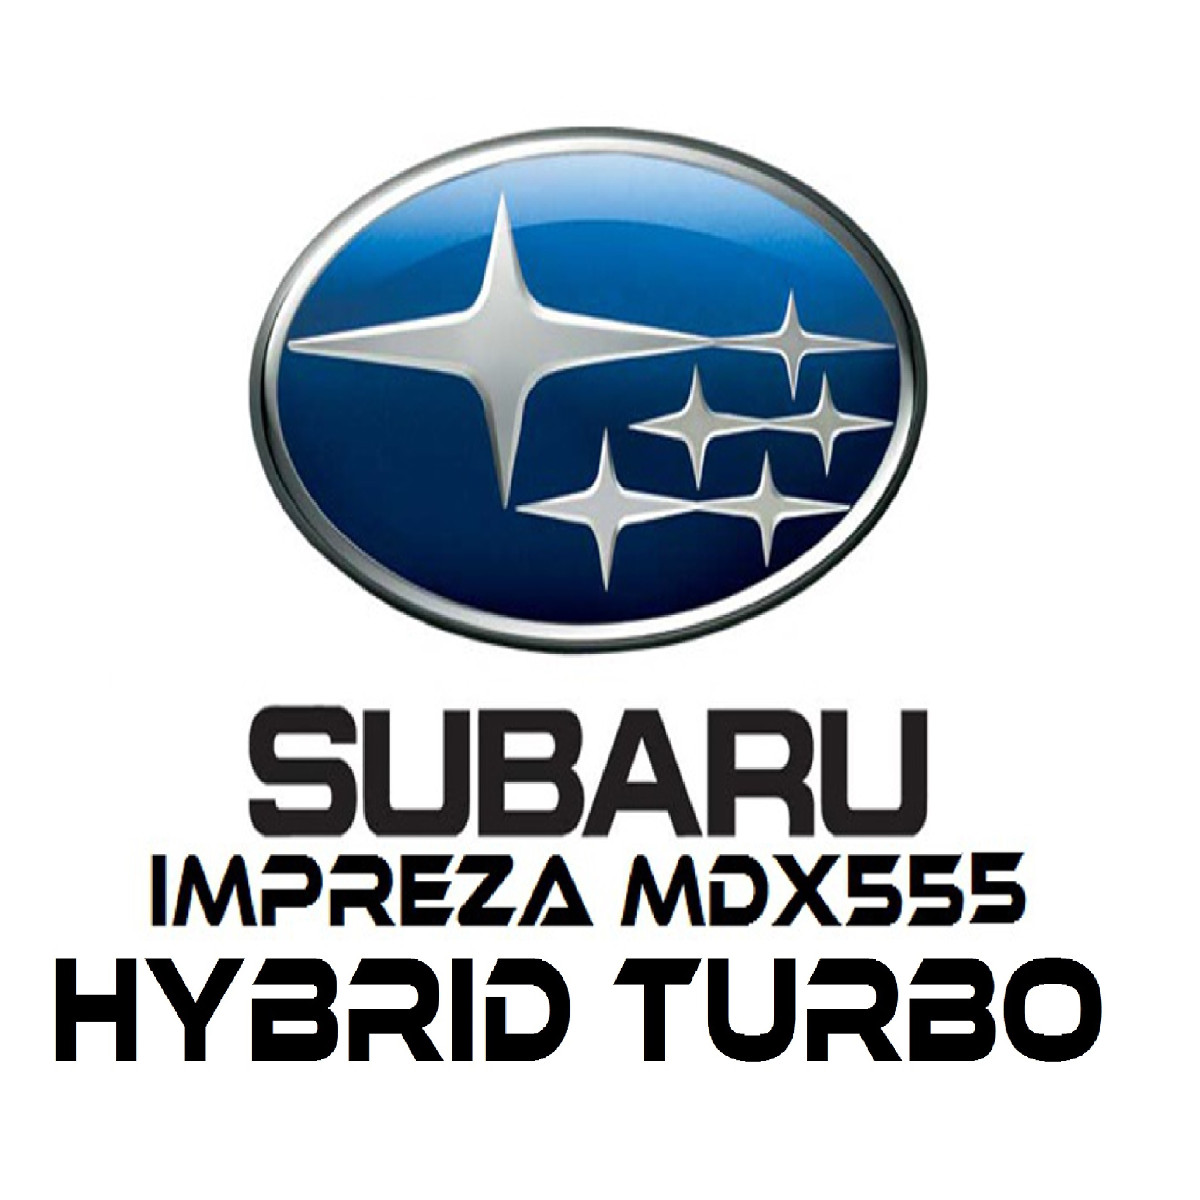 Subaru Impreza Hybrid Turbos MDX555